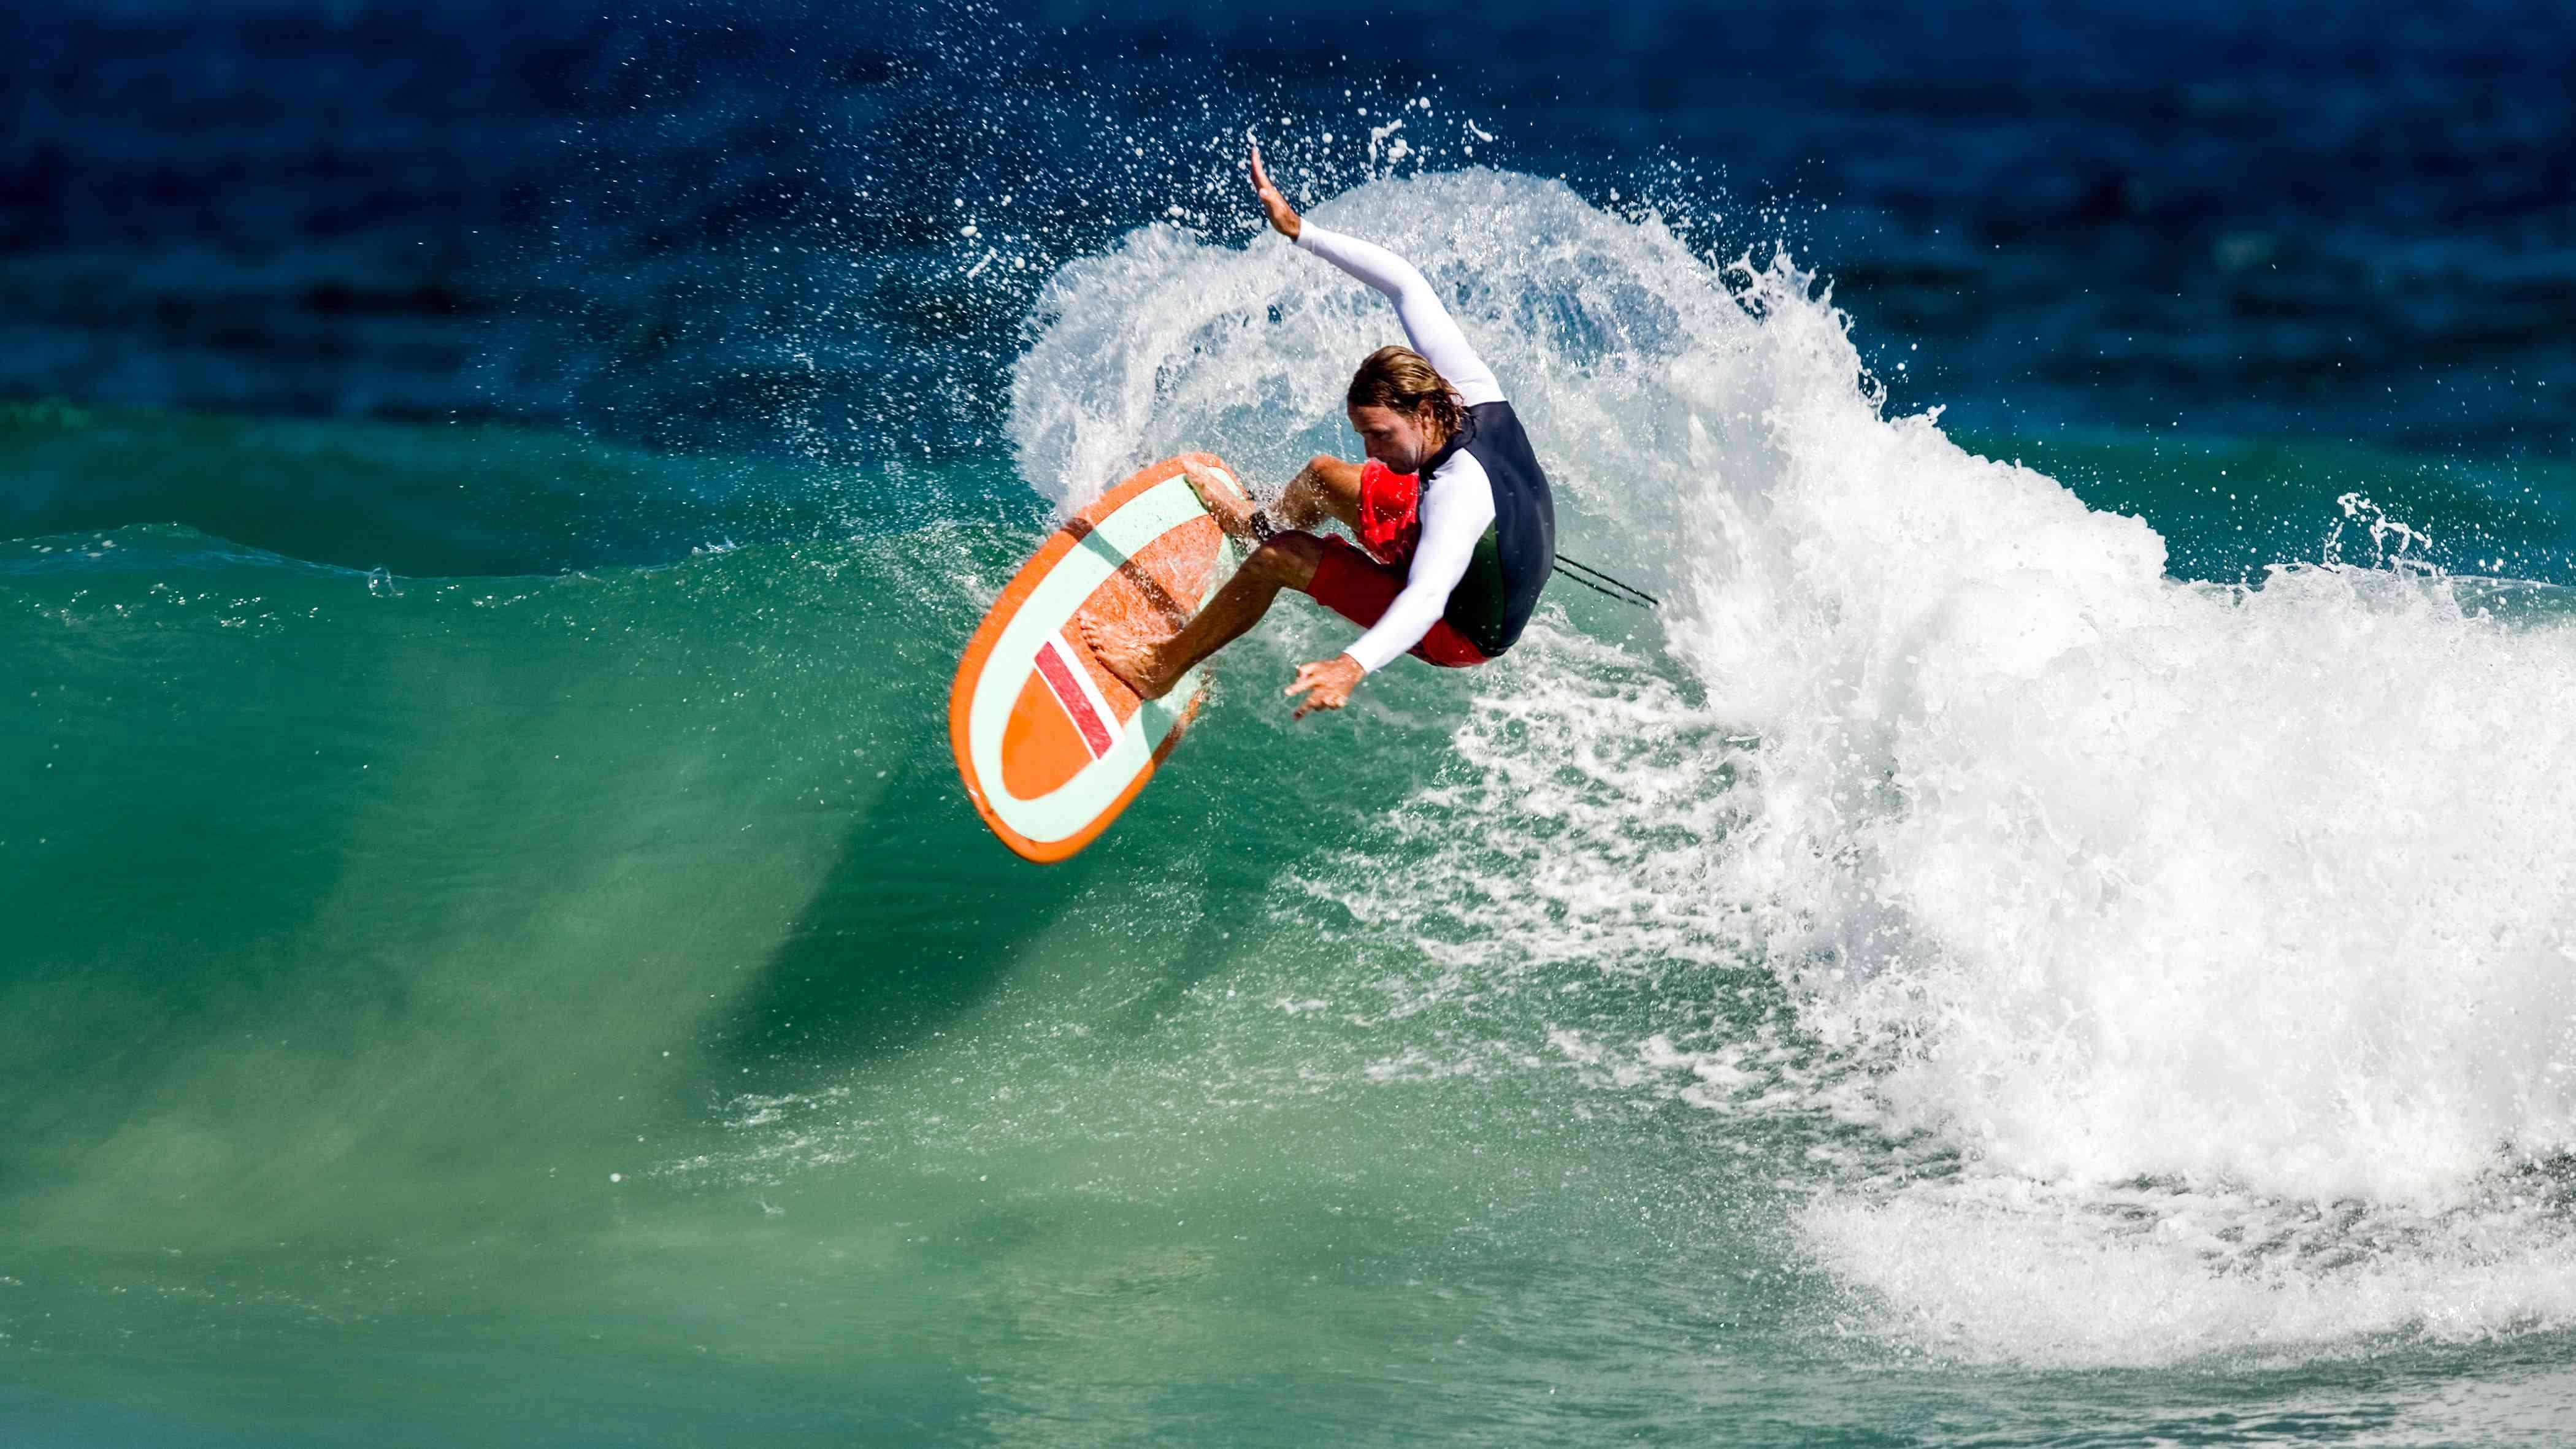 white man surfing a wave on Masirah Island